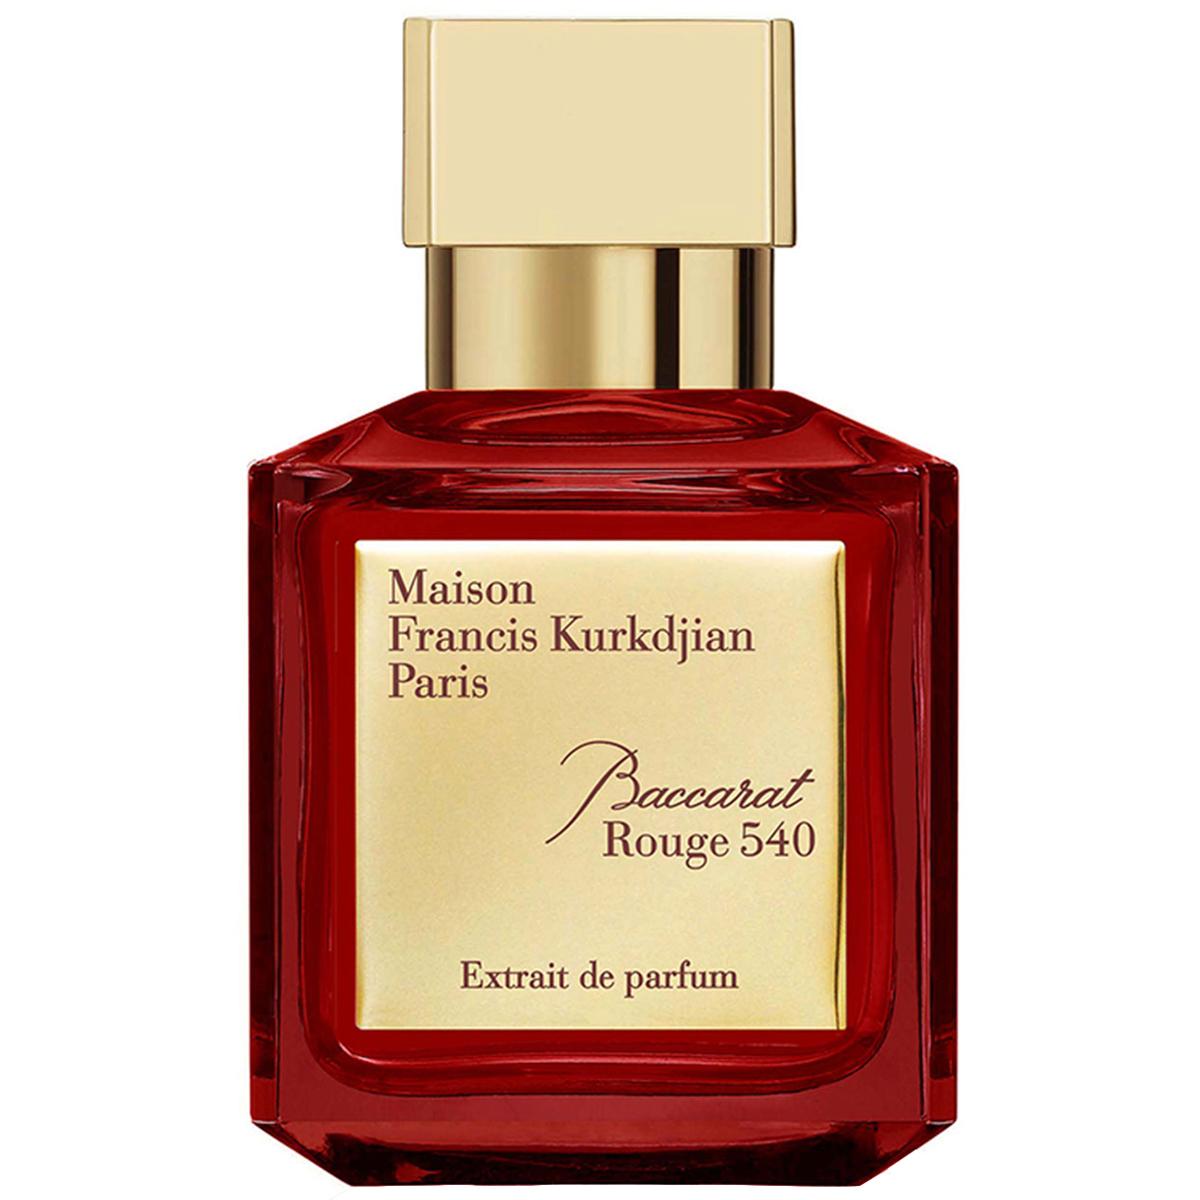 پرفیوم میسون فرانسیس کورکجان مدل Baccarat Rouge 540 Extrait de Parfum حجم 70 میلی لیتر